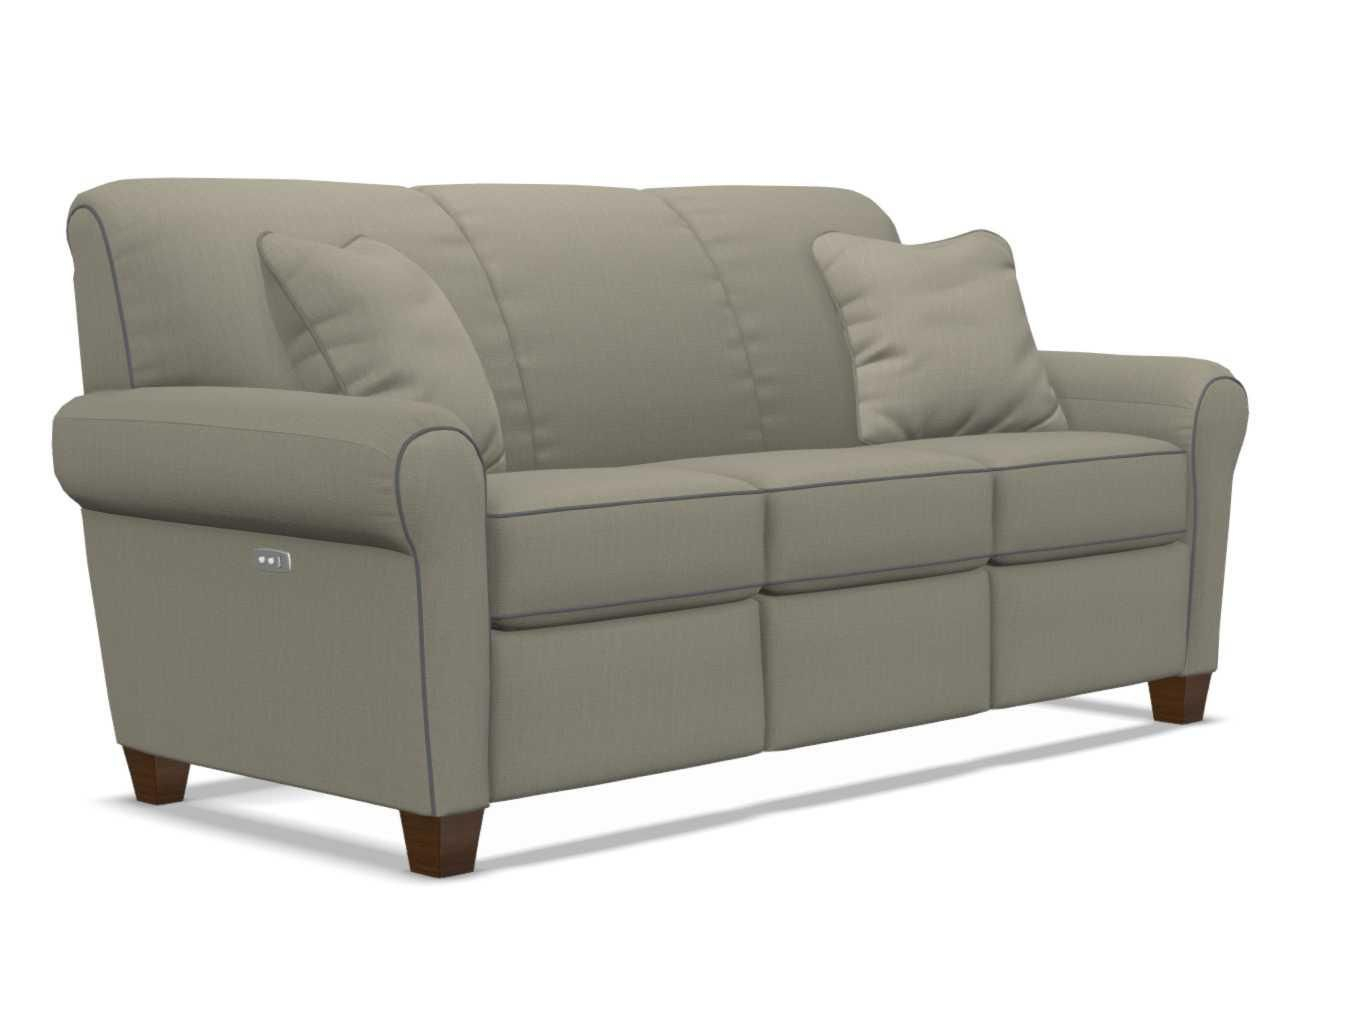 Bennett Duo® Reclining Sofa | Reclining Sofa, Sofa, Power Intended For Bennett Power Reclining Sofas (View 10 of 15)